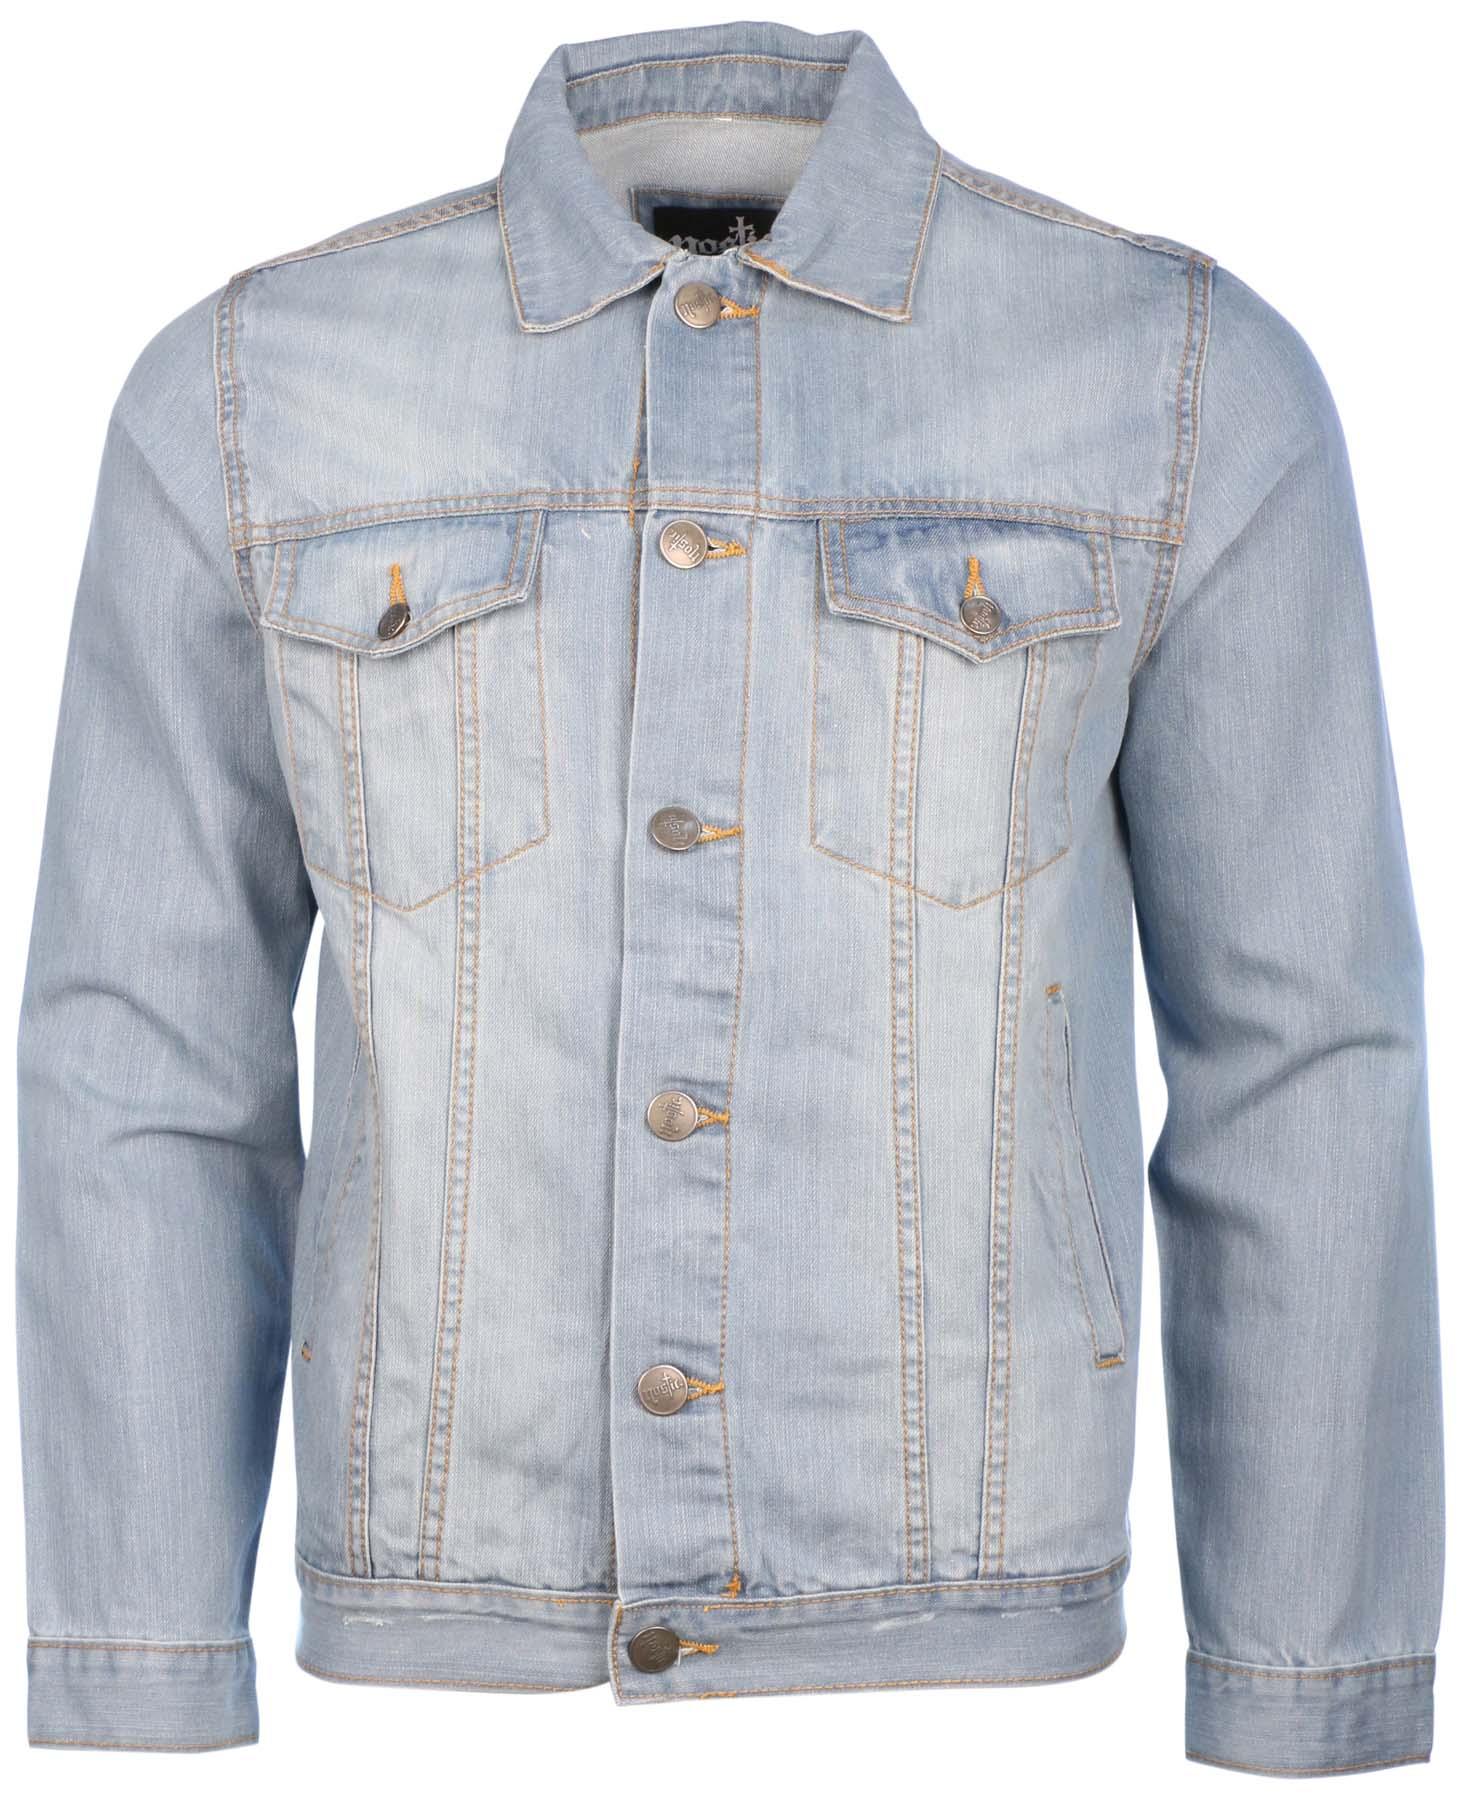 Nostic Menu0026#39;s Button Front Denim Jean Jacket | eBay